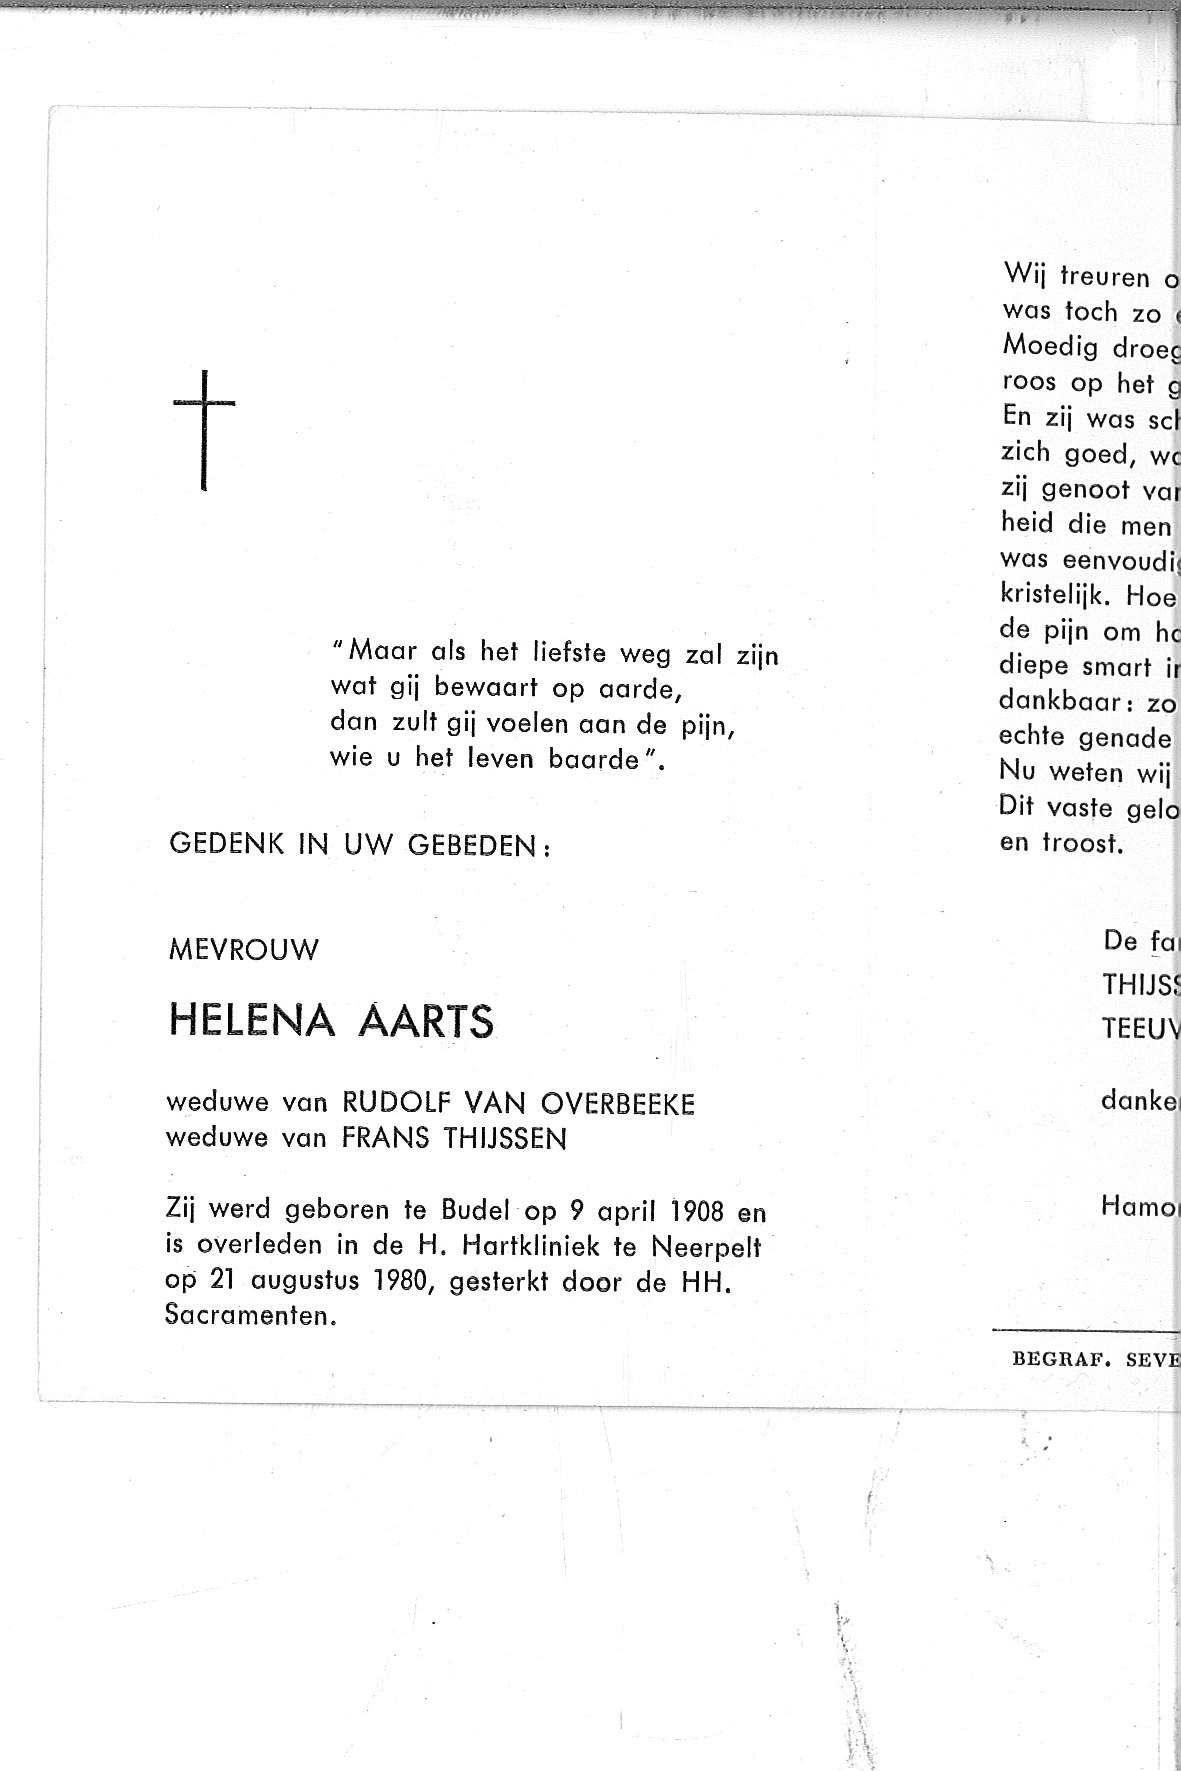 Helena(1980)20130627135409_00002.jpg